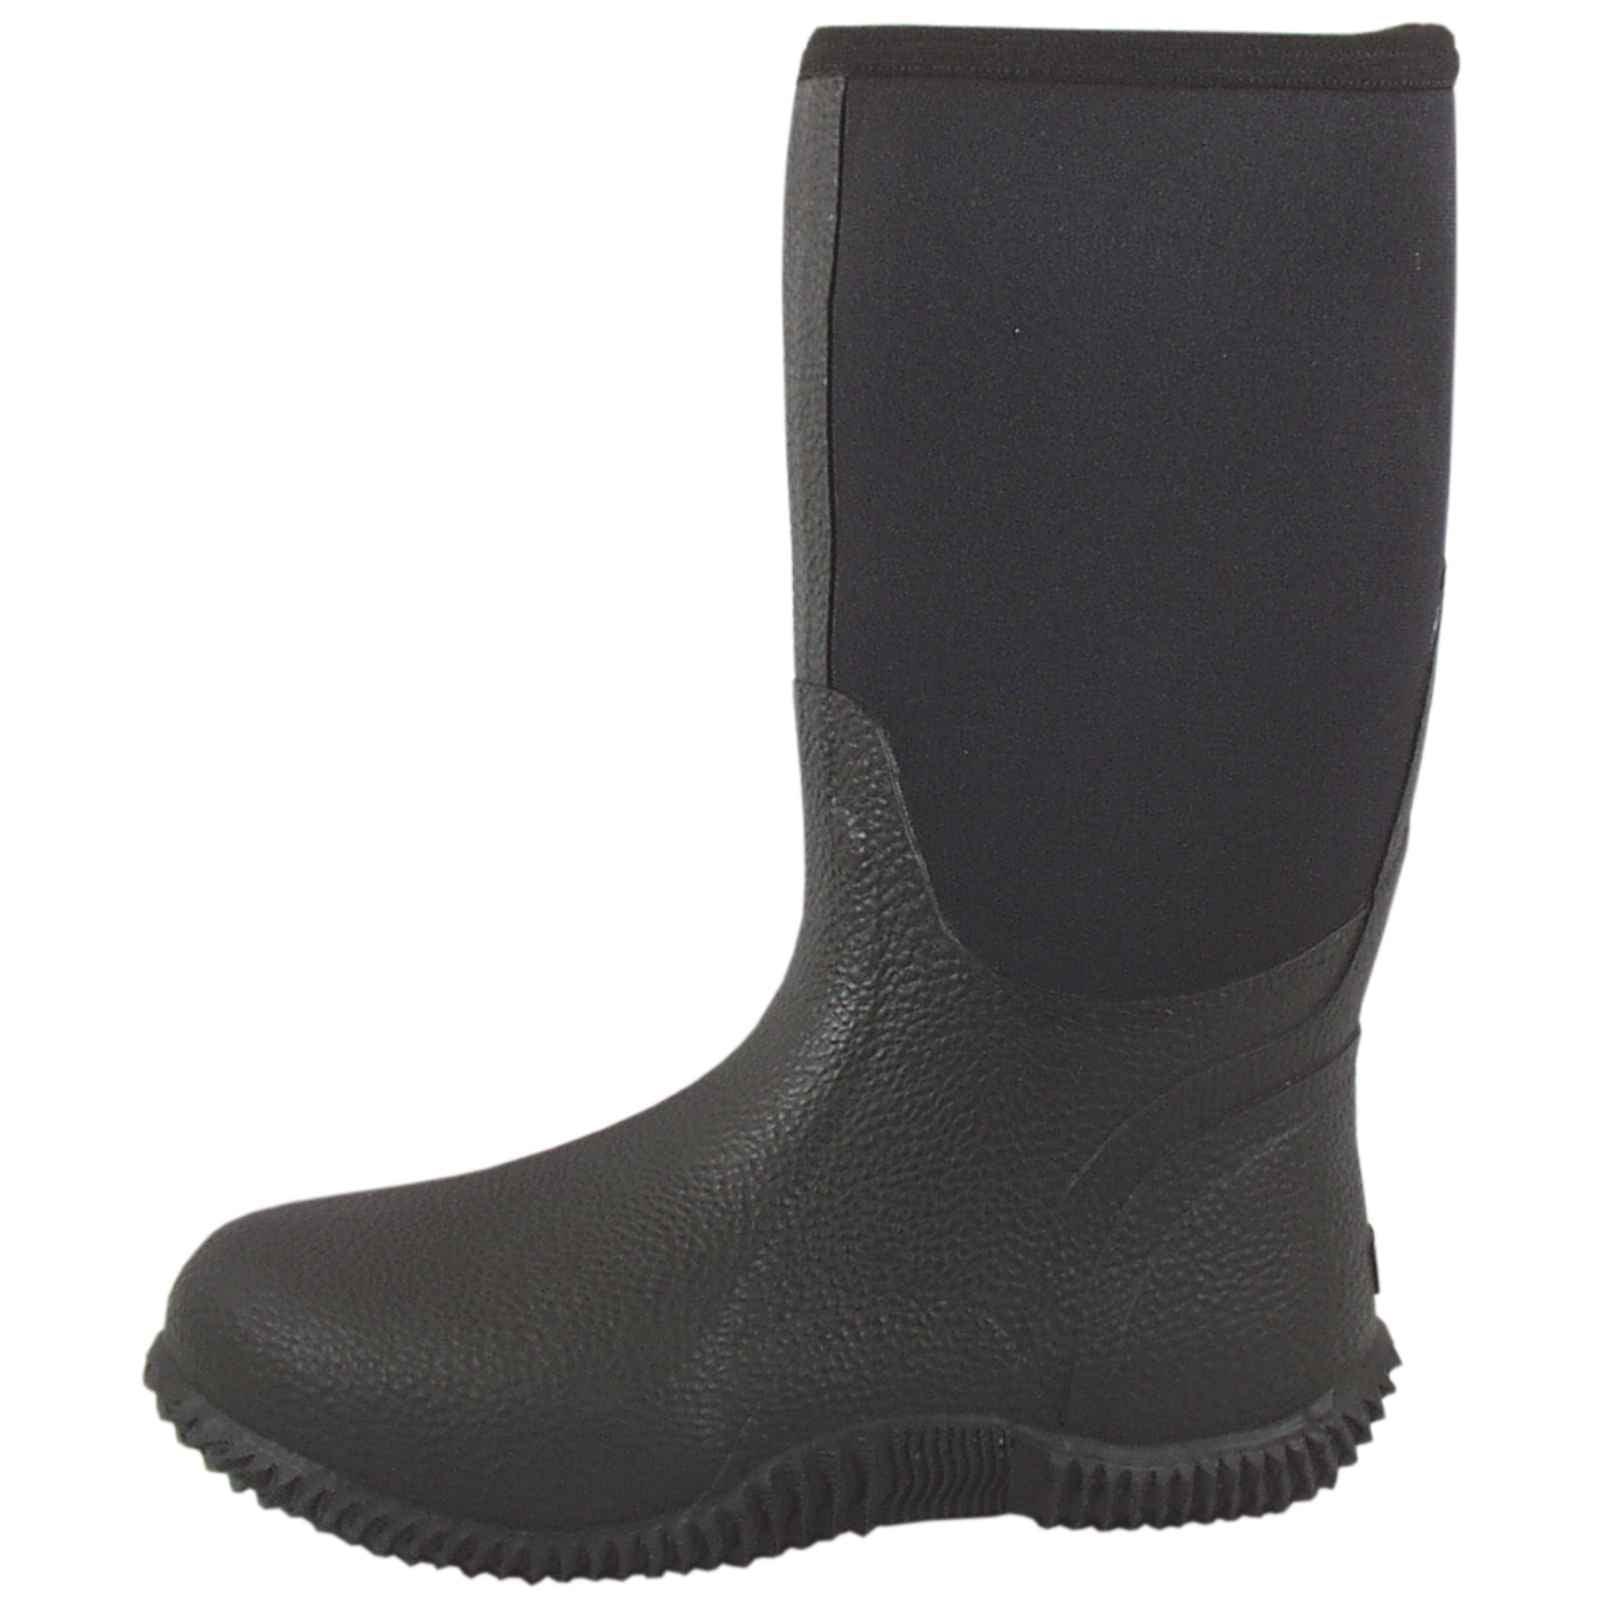 Smoky Mountain Men's Amphibian Boot Round Toe - 4712